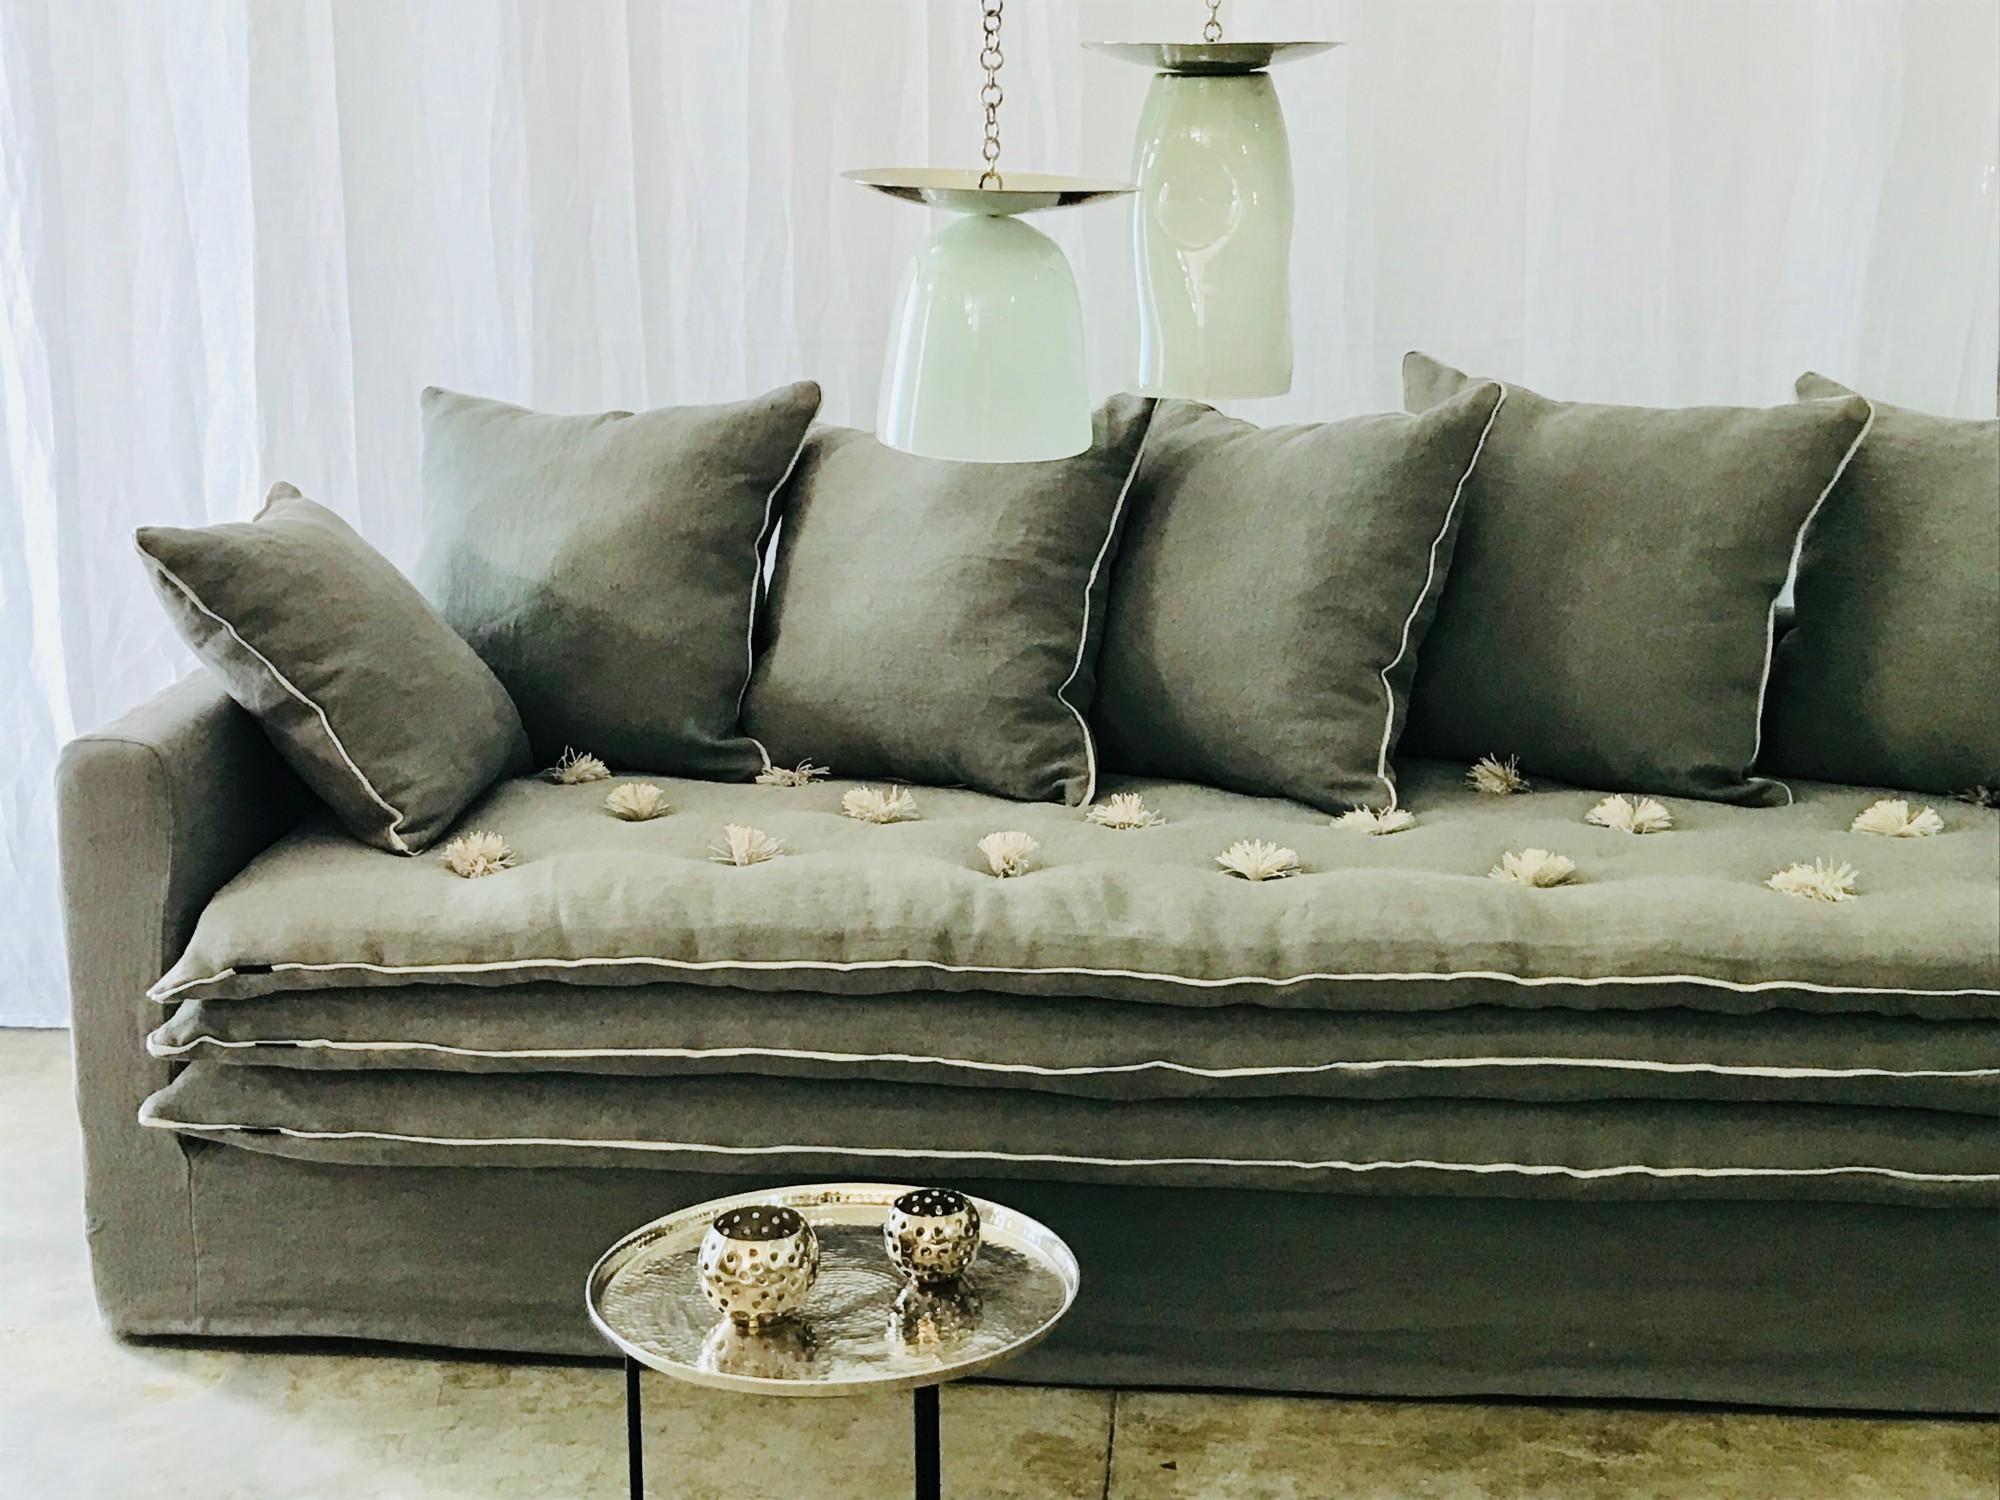 fabrication de canap sur mesure en tissu paris. Black Bedroom Furniture Sets. Home Design Ideas